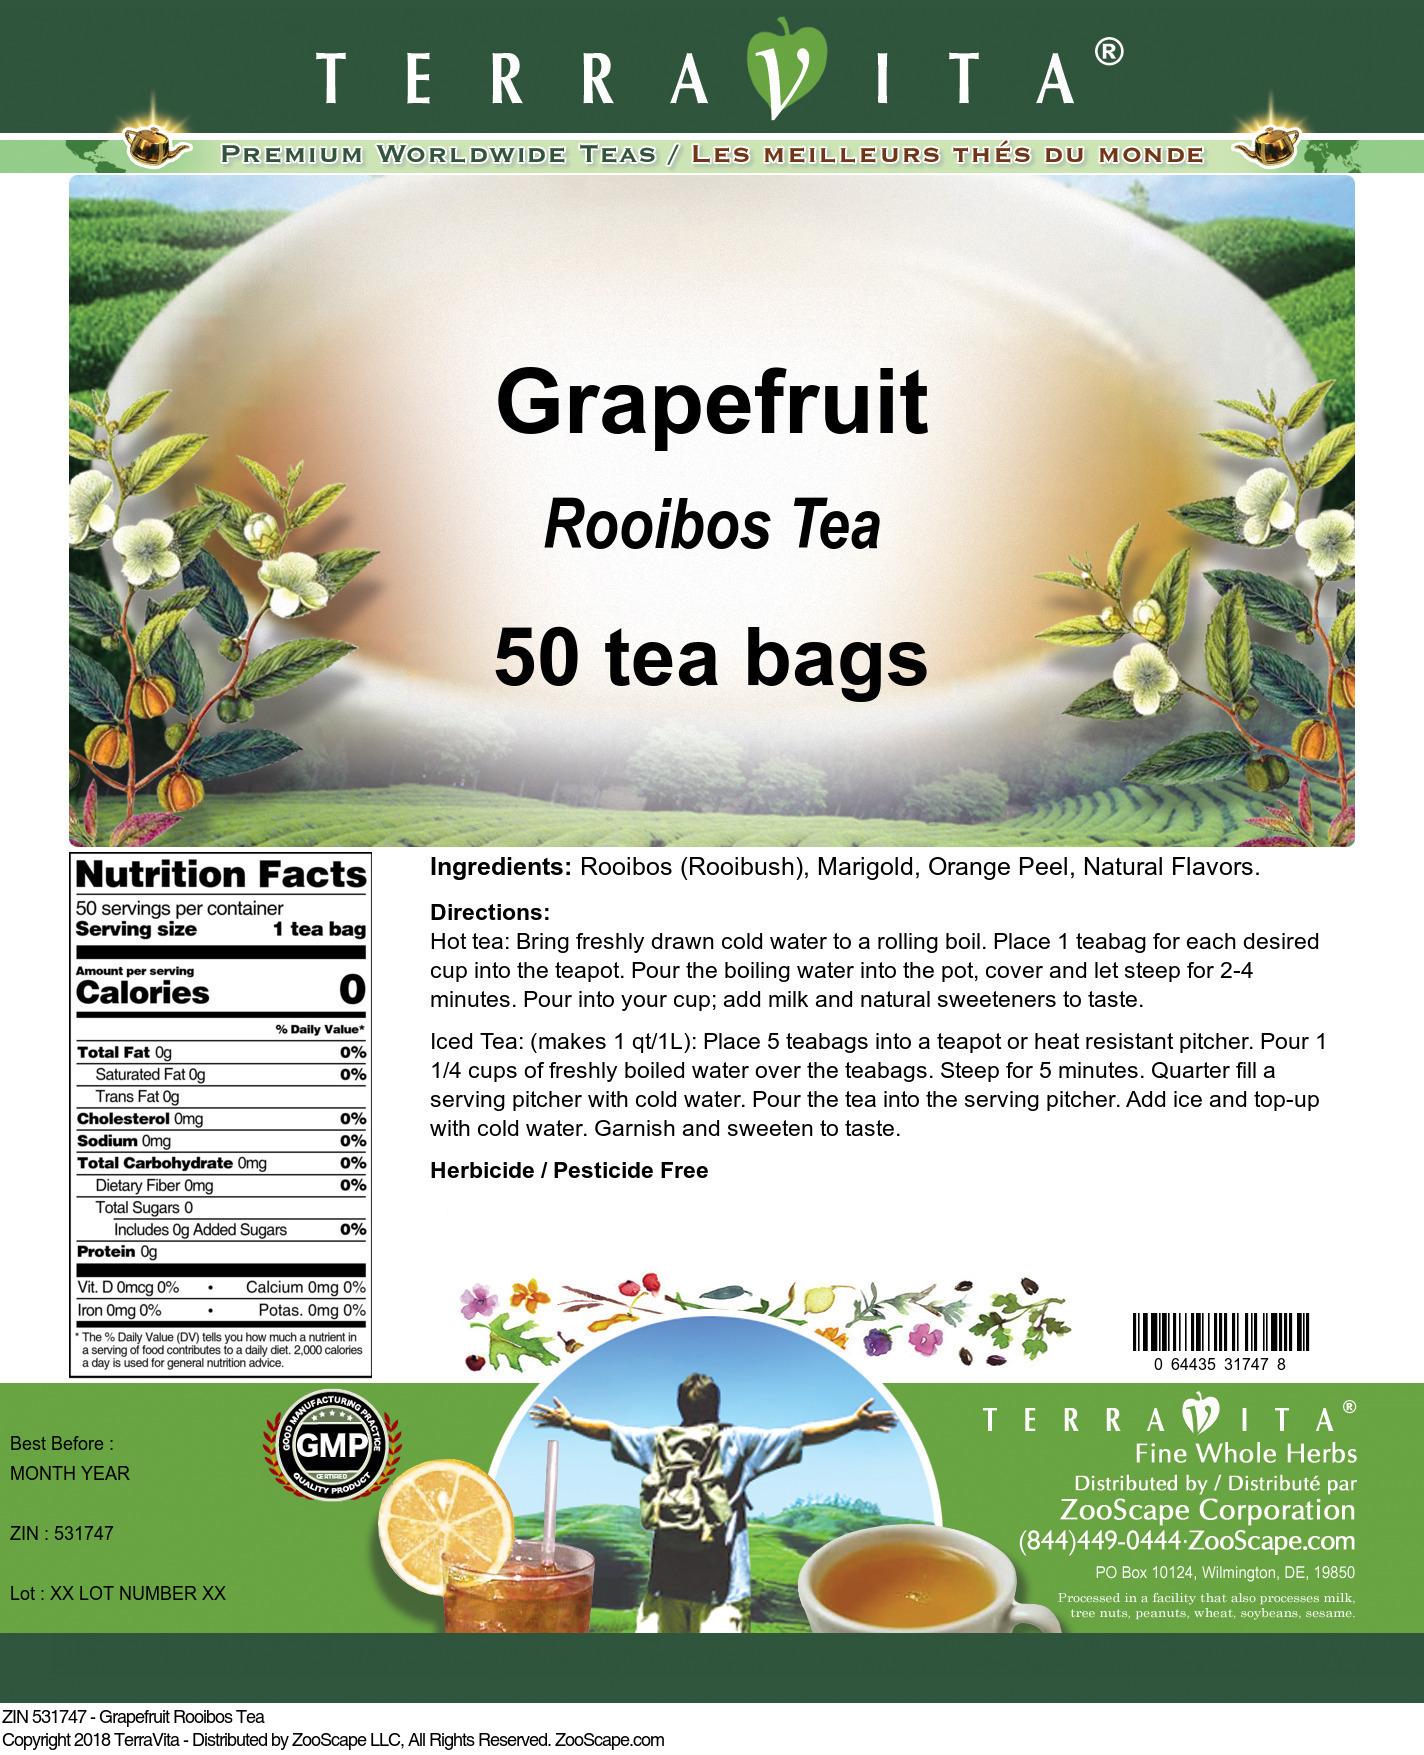 Grapefruit Rooibos Tea